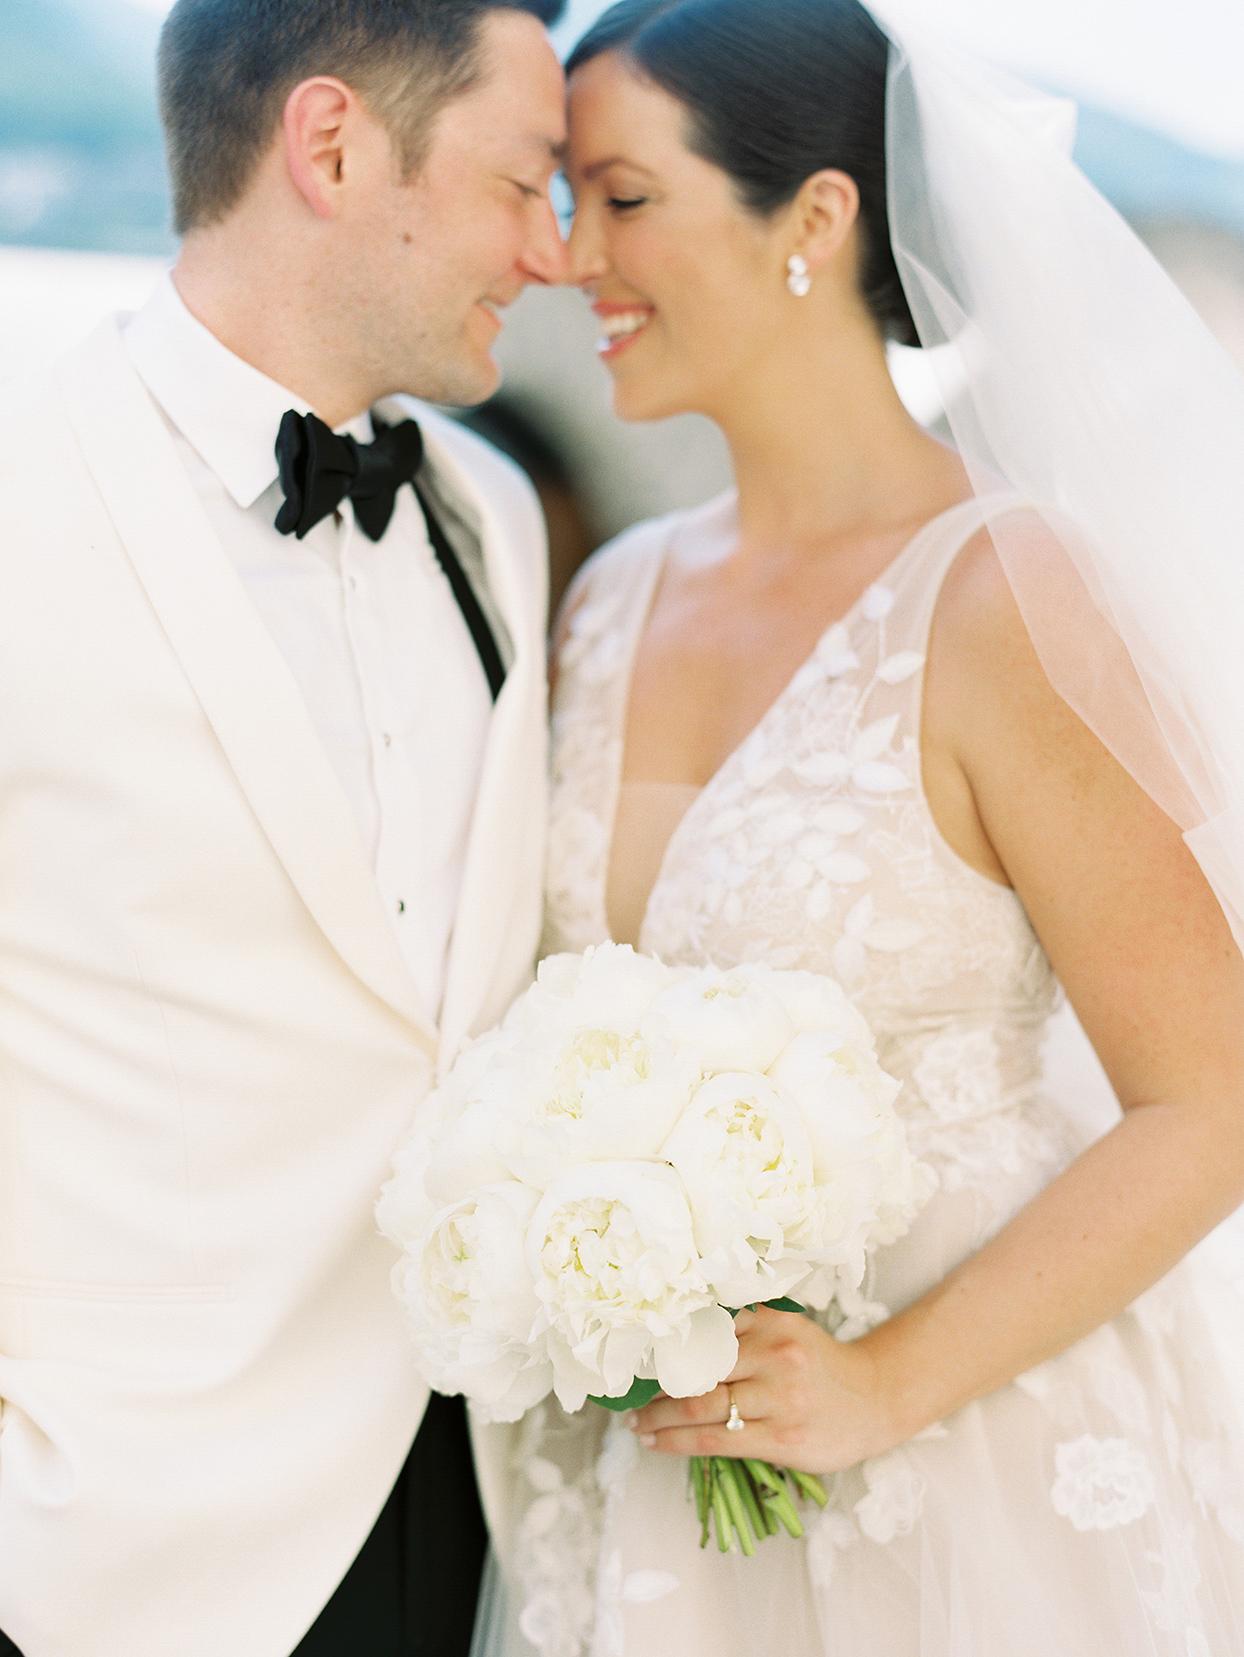 jacqueline david wedding couple in white